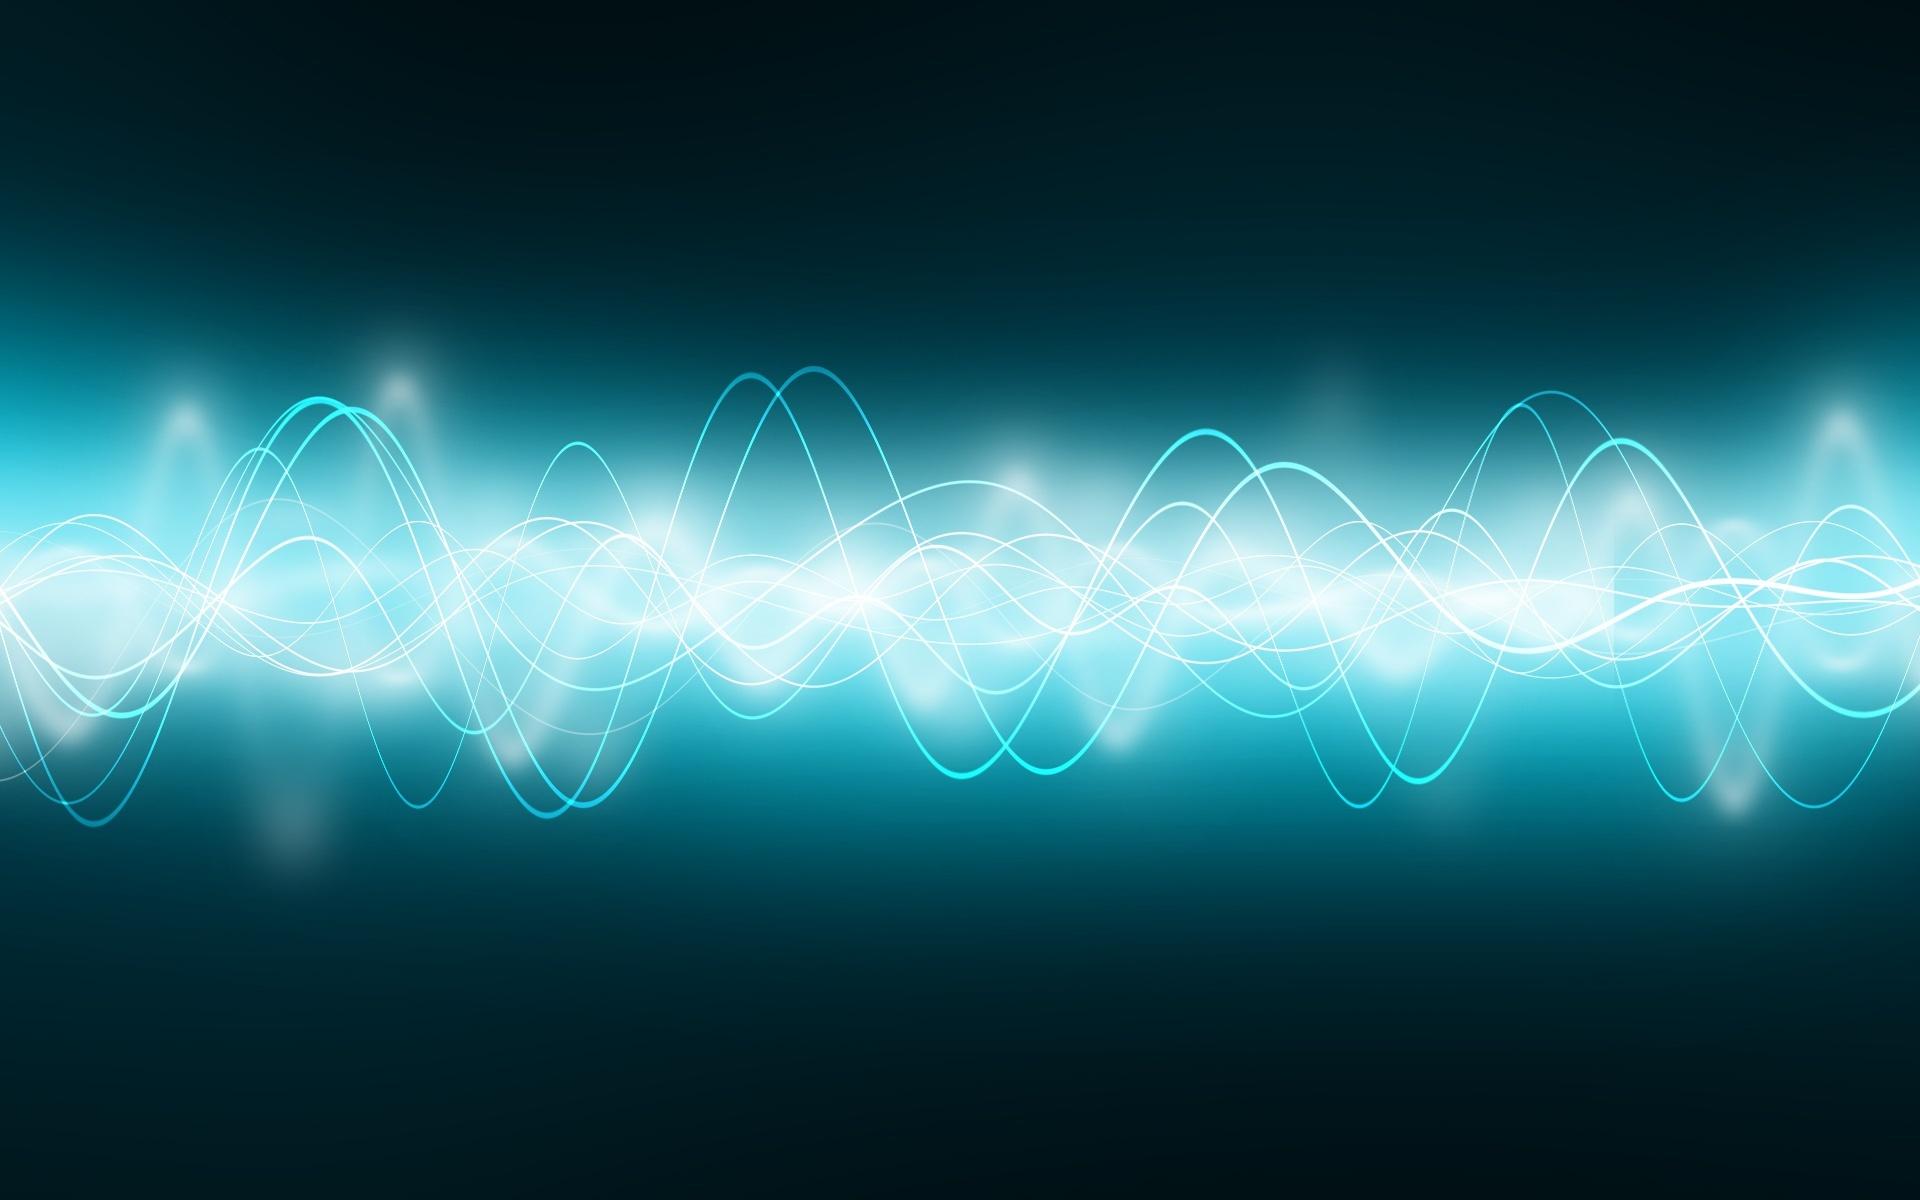 Simple Wallpaper Music Soundwave - sound-wave-wallpaper-47336-48863-hd-wallpapers  Snapshot_889743.jpg